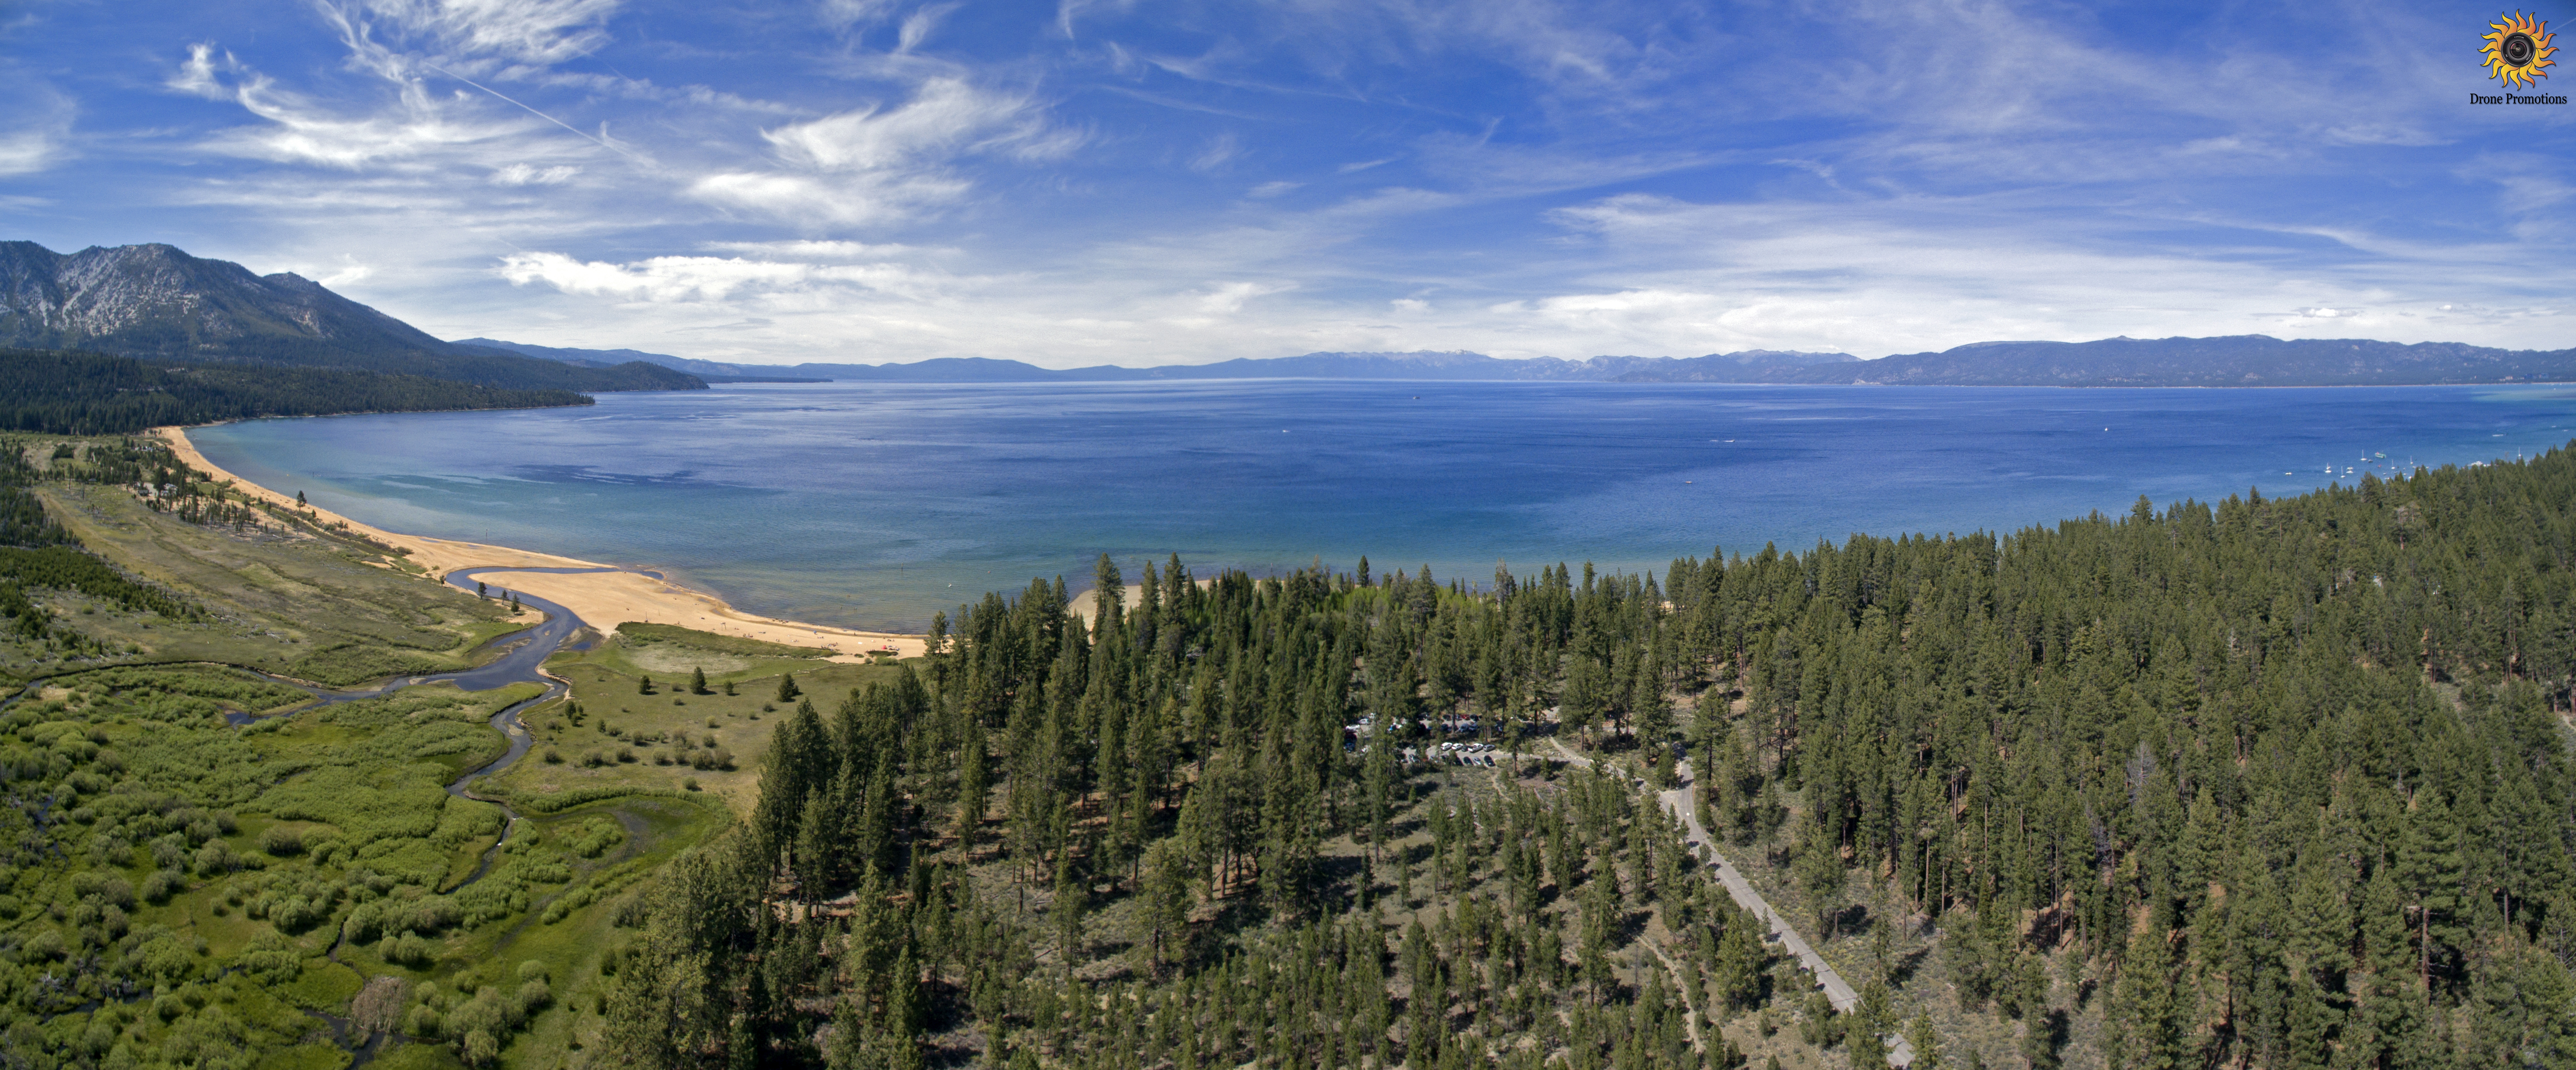 Taylor Creek, South Lake Tahoe, California, USA